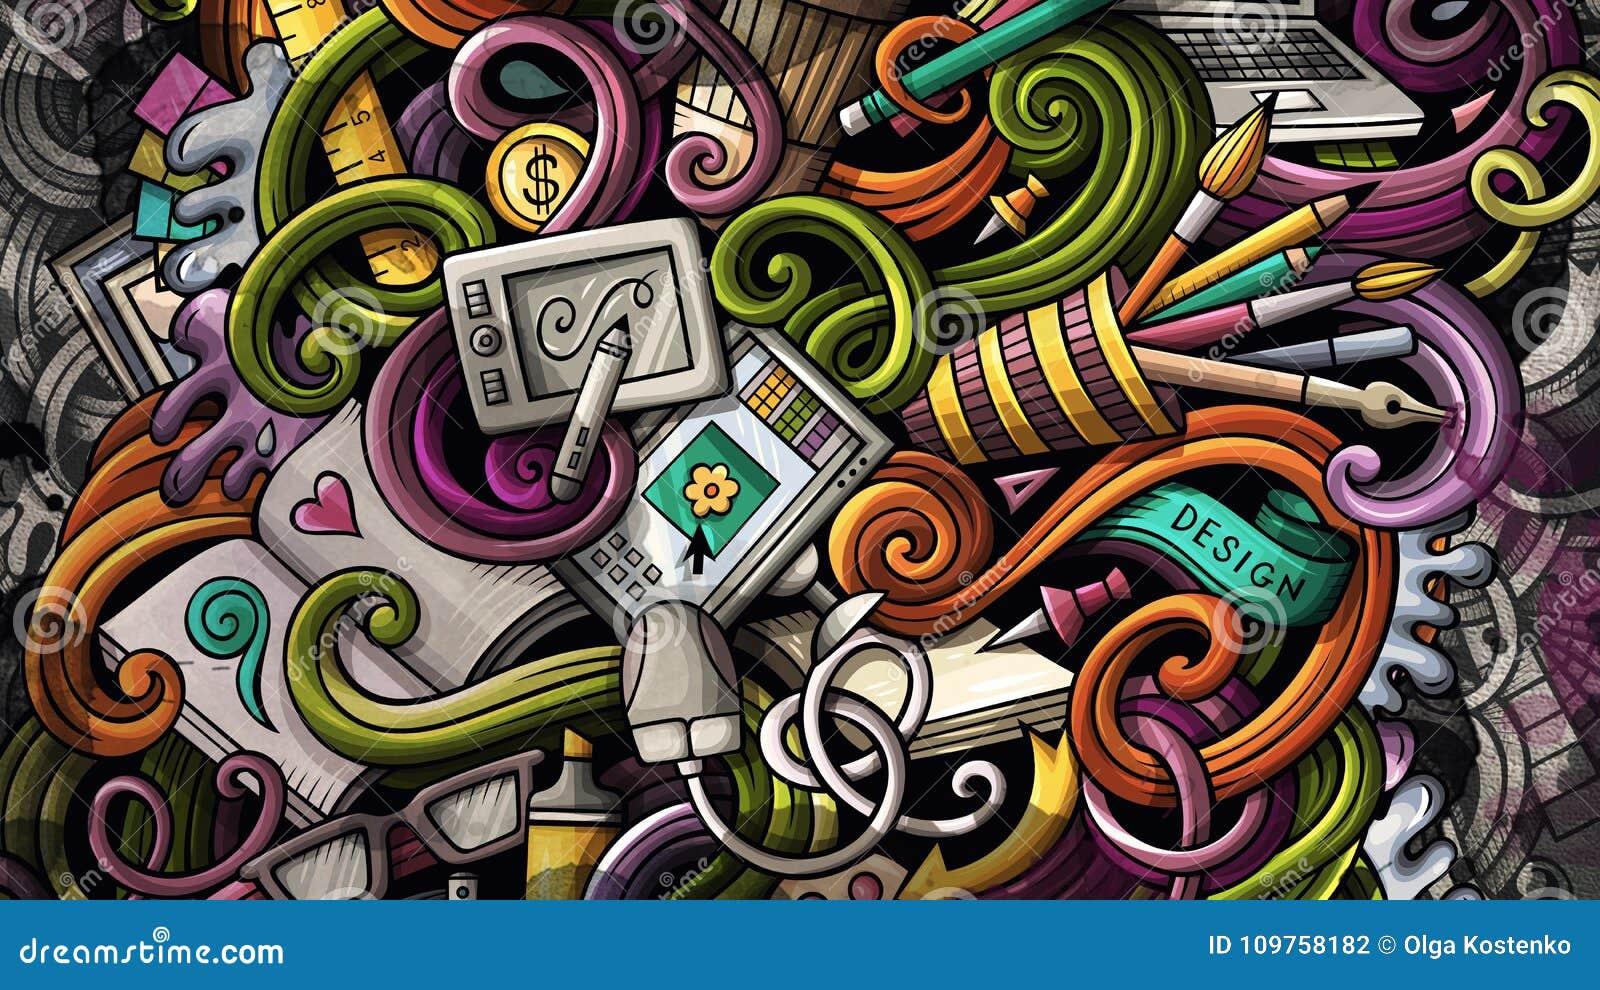 Doodles Graphic Design Illustration Creative Art Background